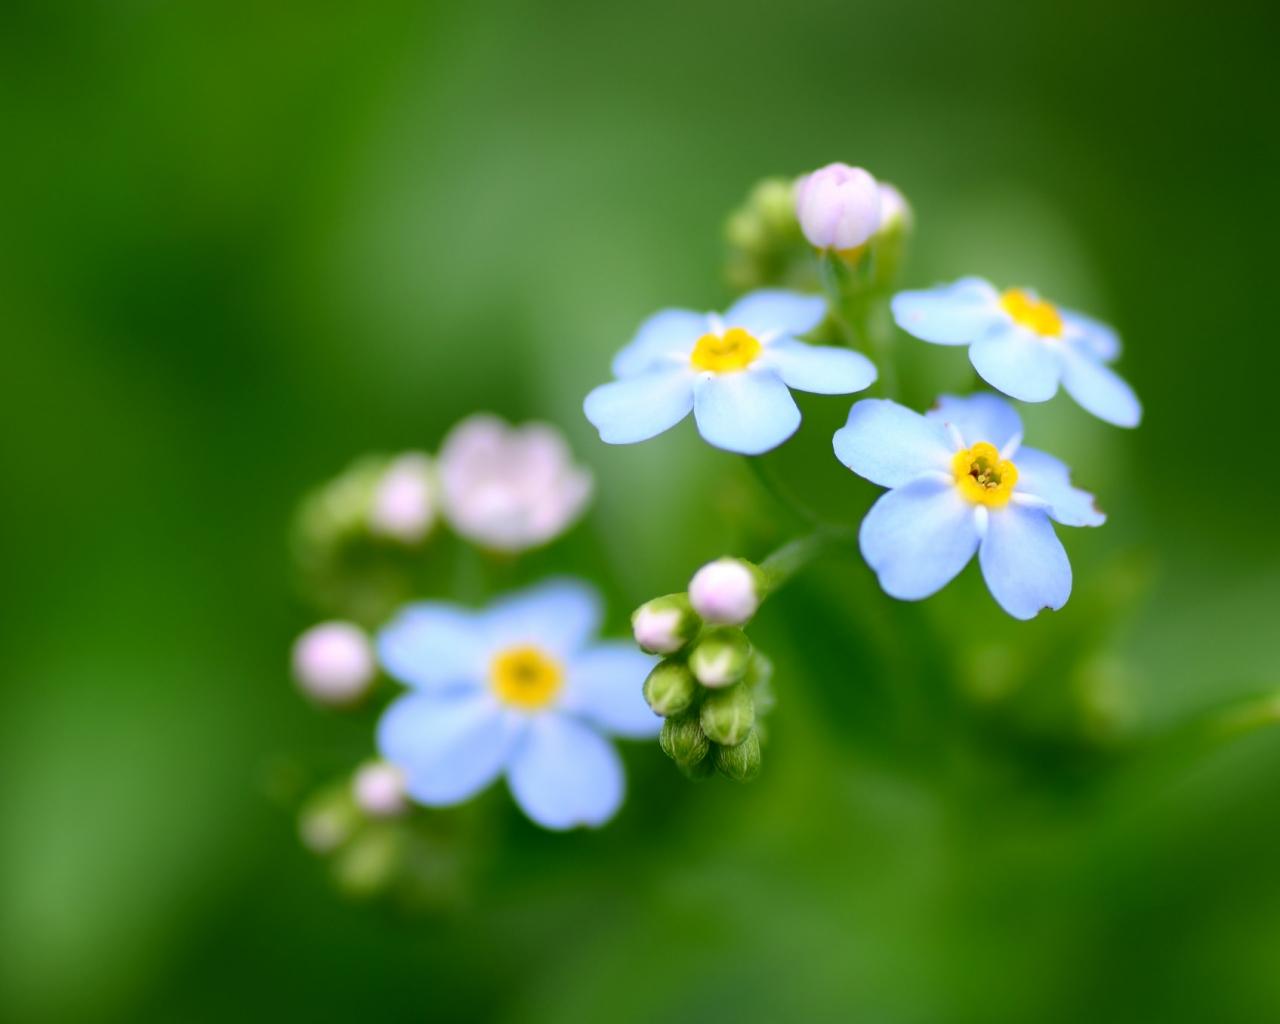 Flores azules - 1280x1024